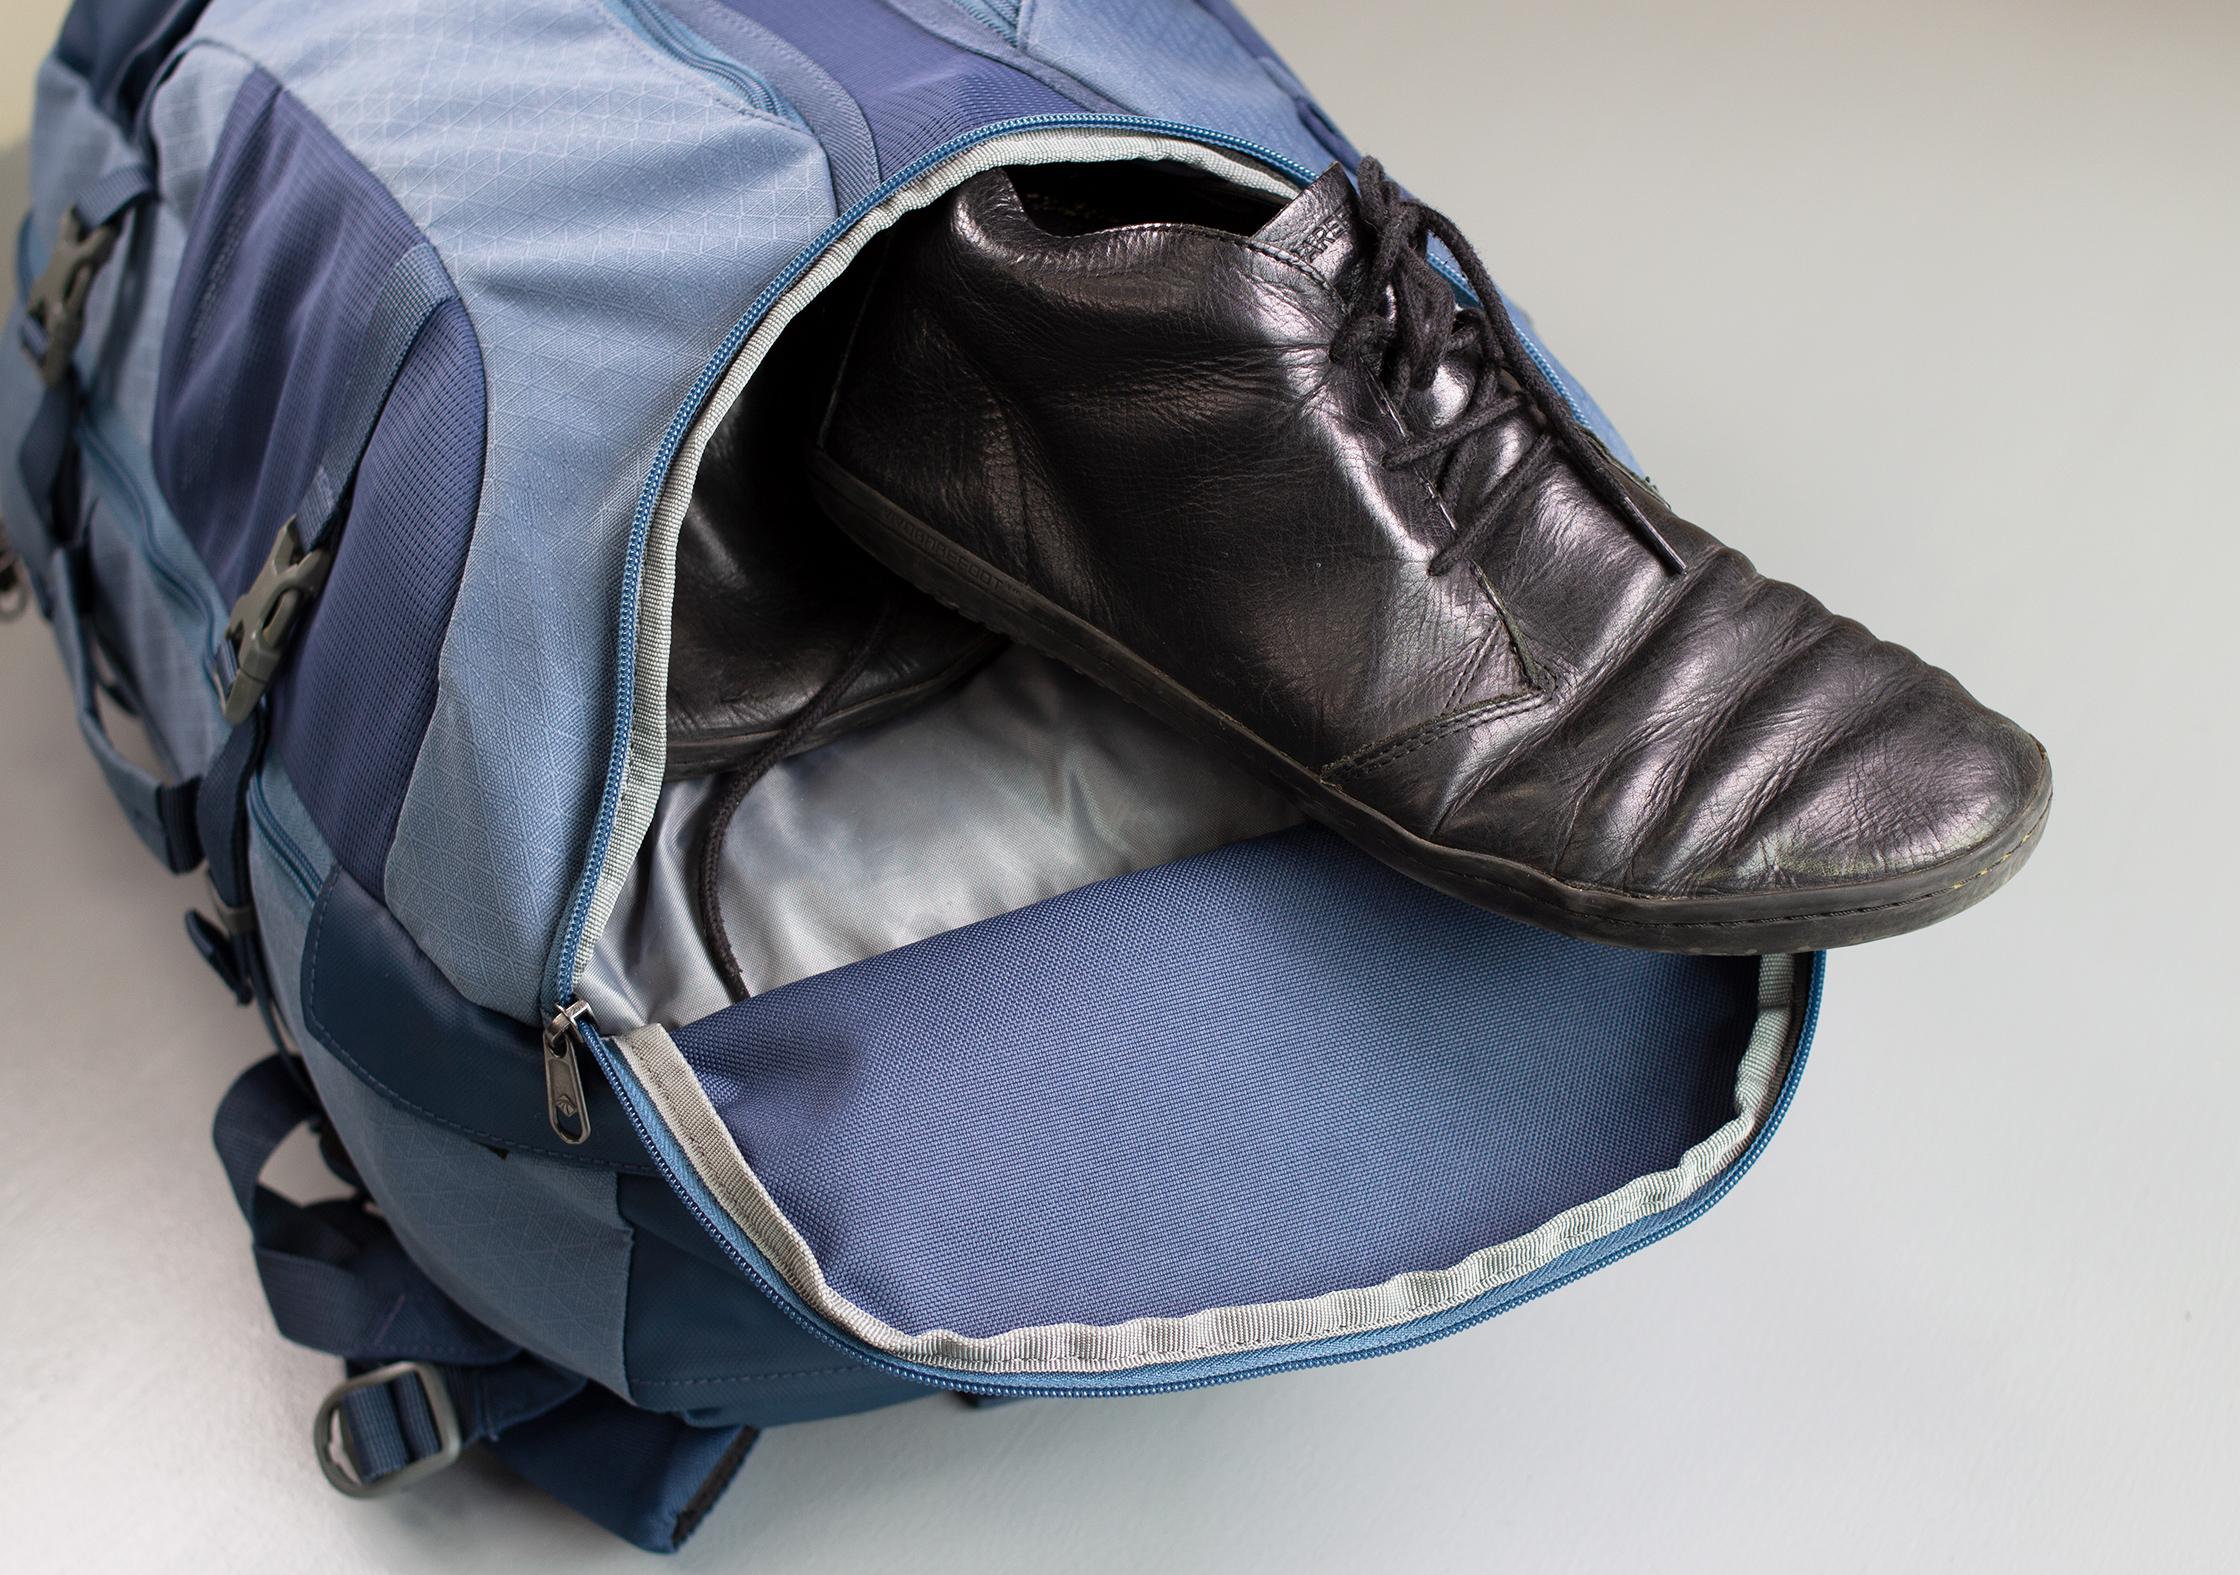 Eagle Creek Global Companion 40L Travel Pack Shoe Compartment